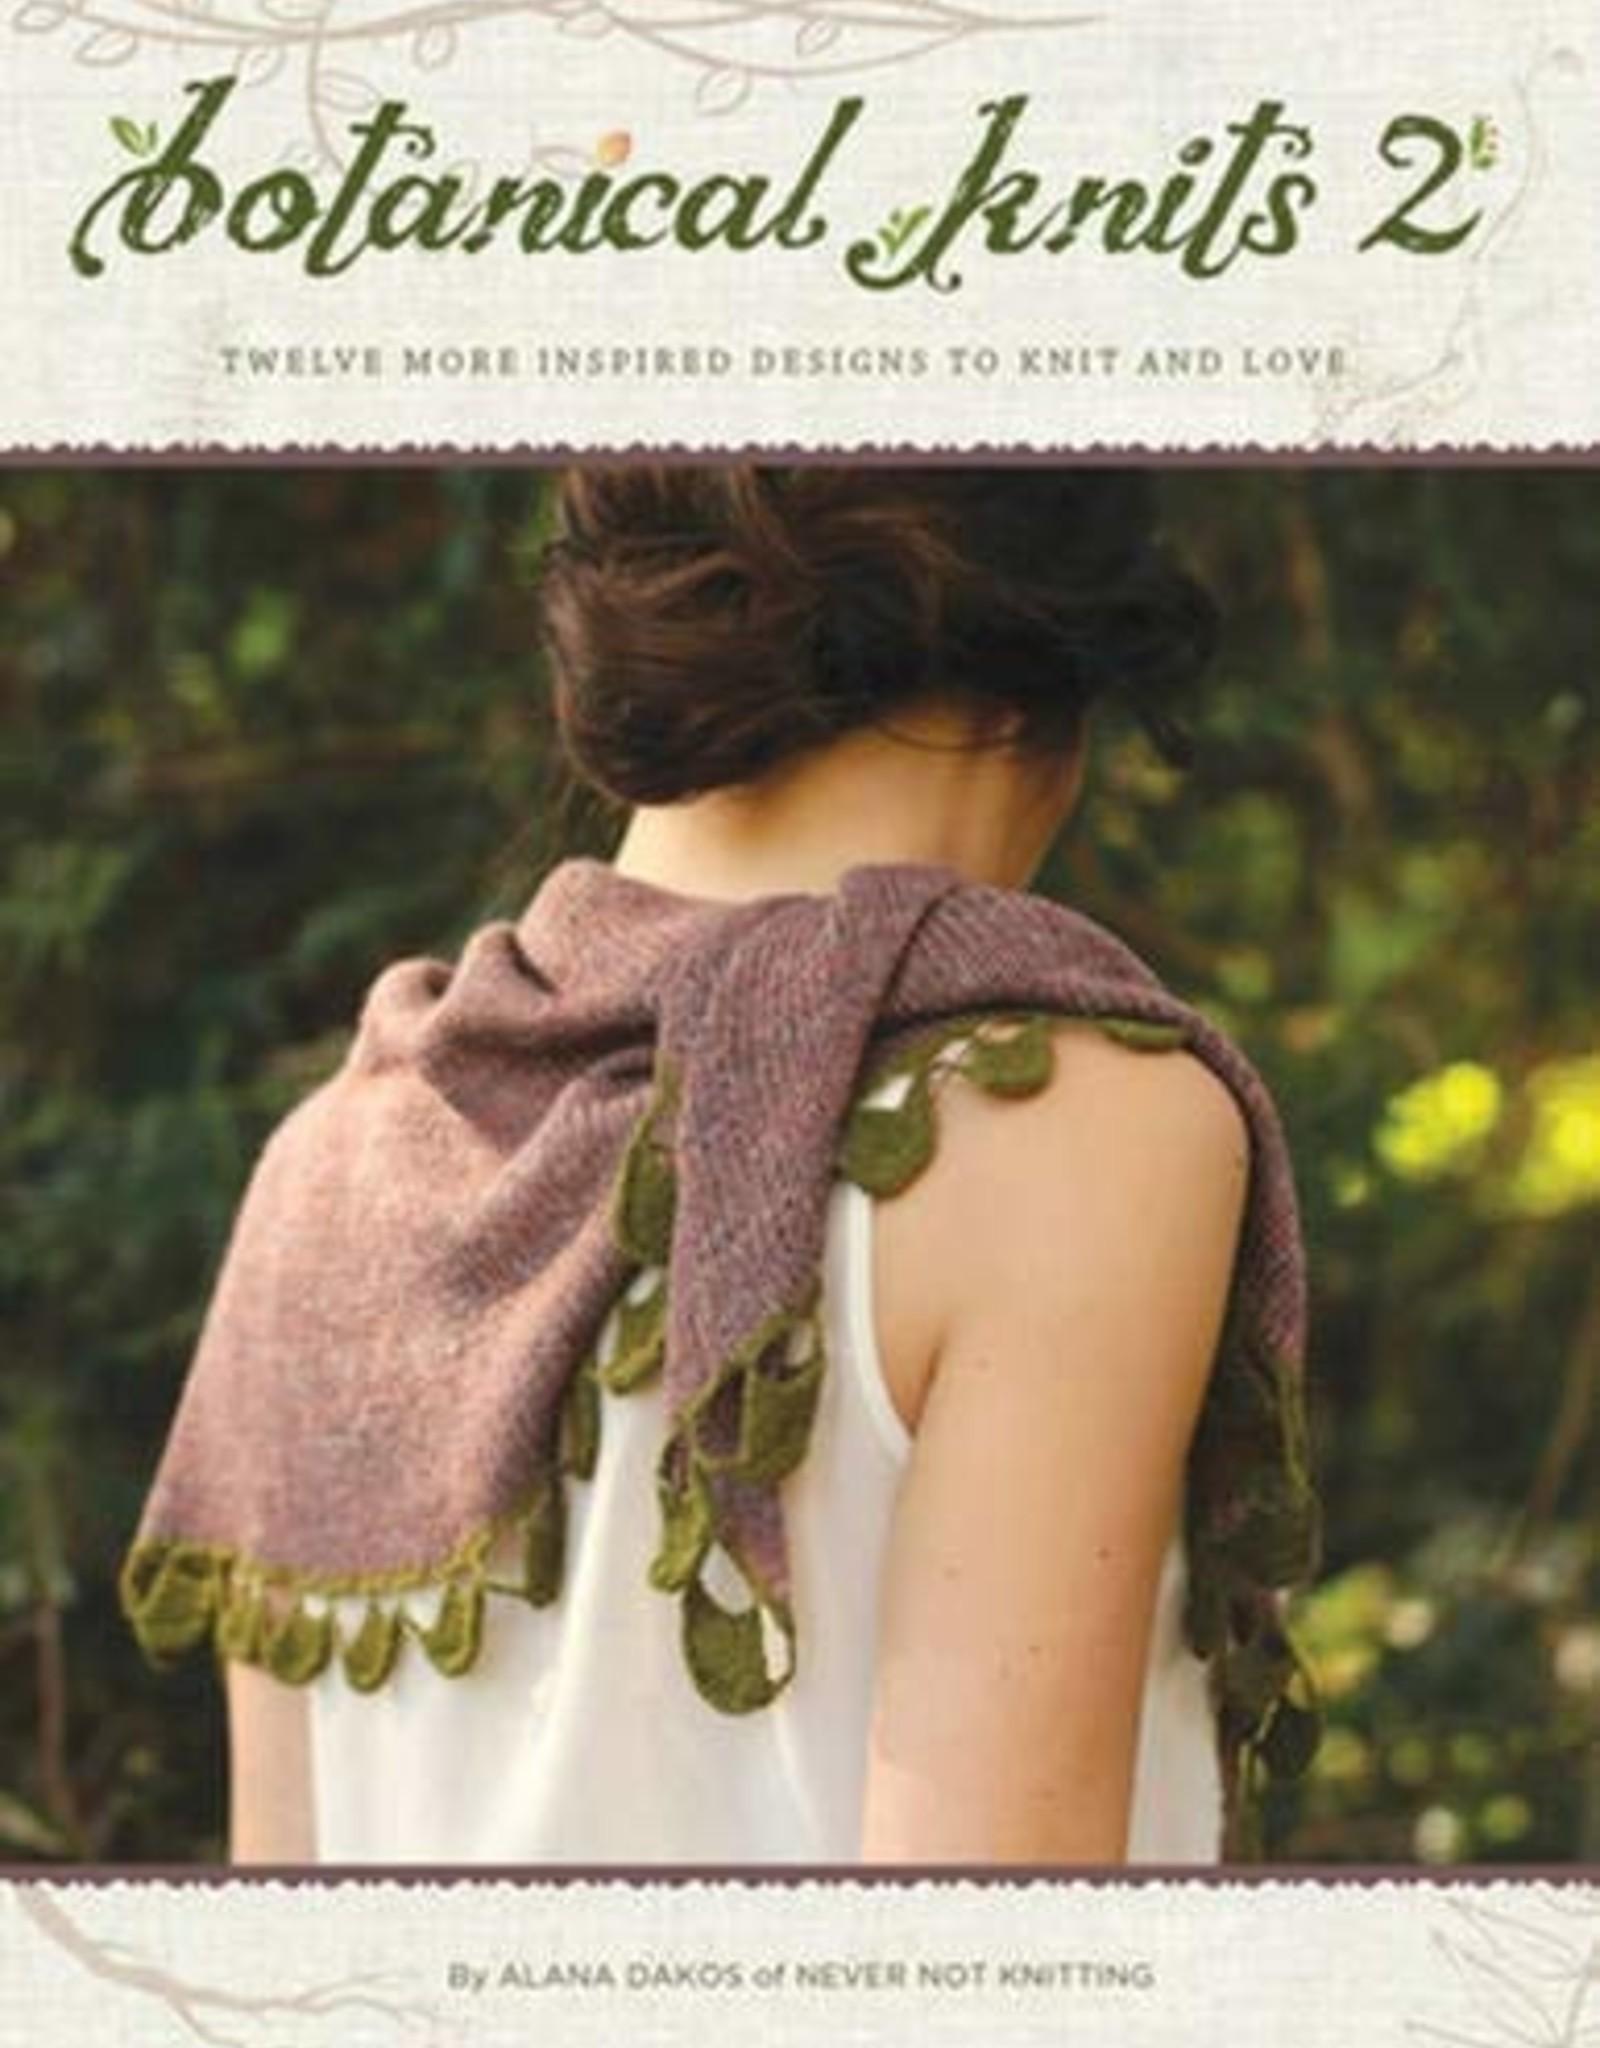 Unicorn Books & Crafts, Inc. Botanical Knits 2